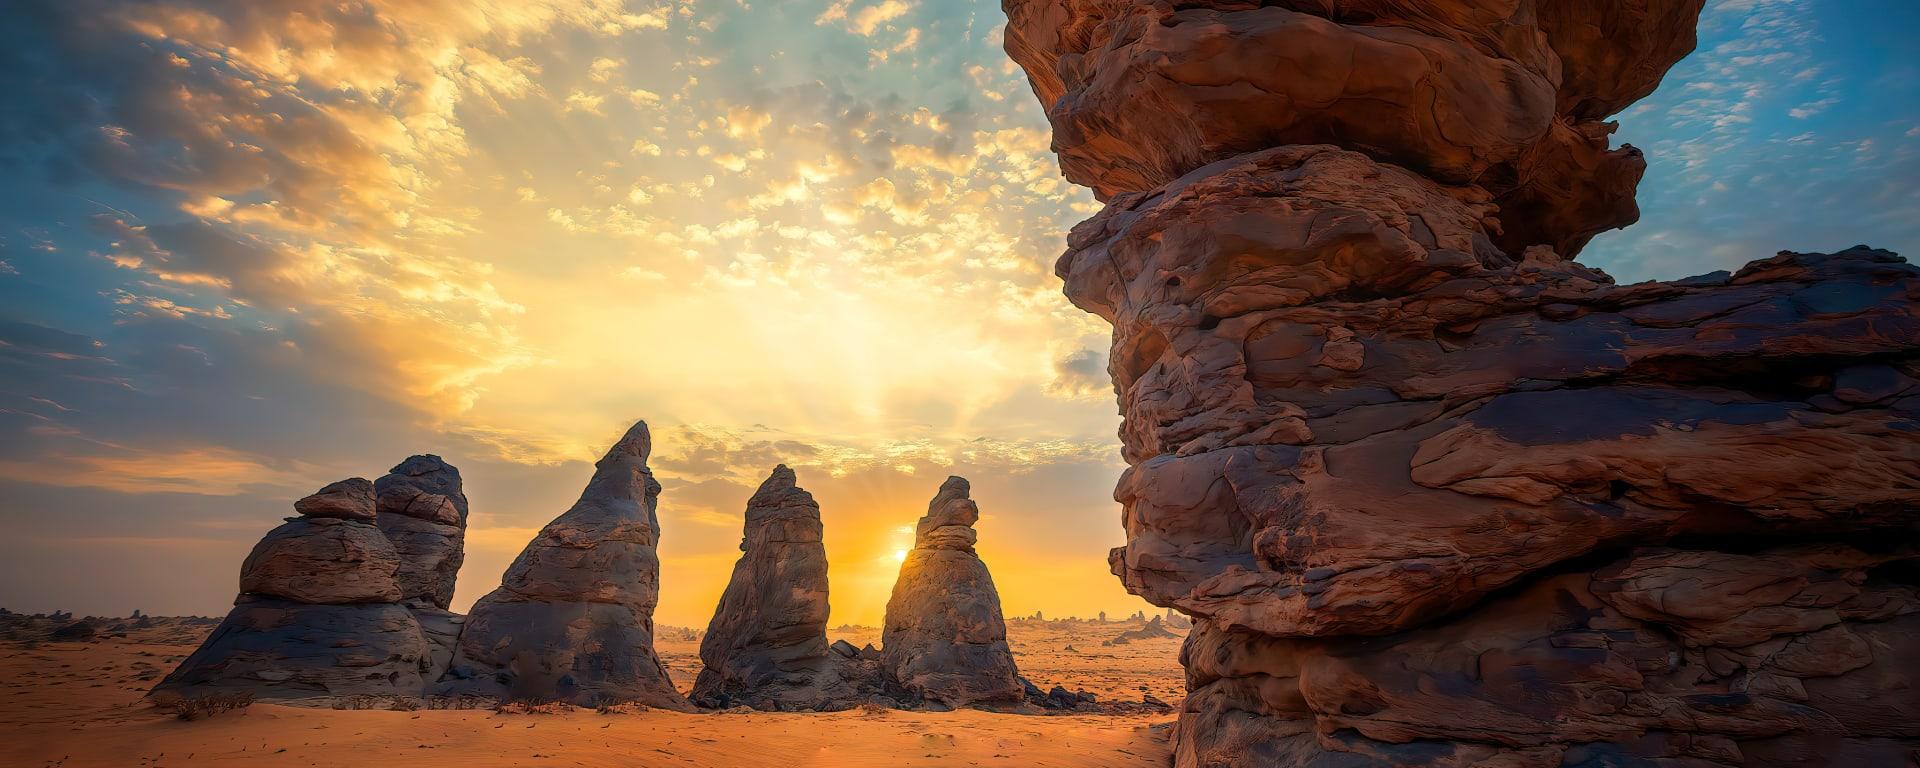 Saudi Arabien entdecken mit Tischler Reisen: Saudi Arabien Hufuf Jabal al Qara